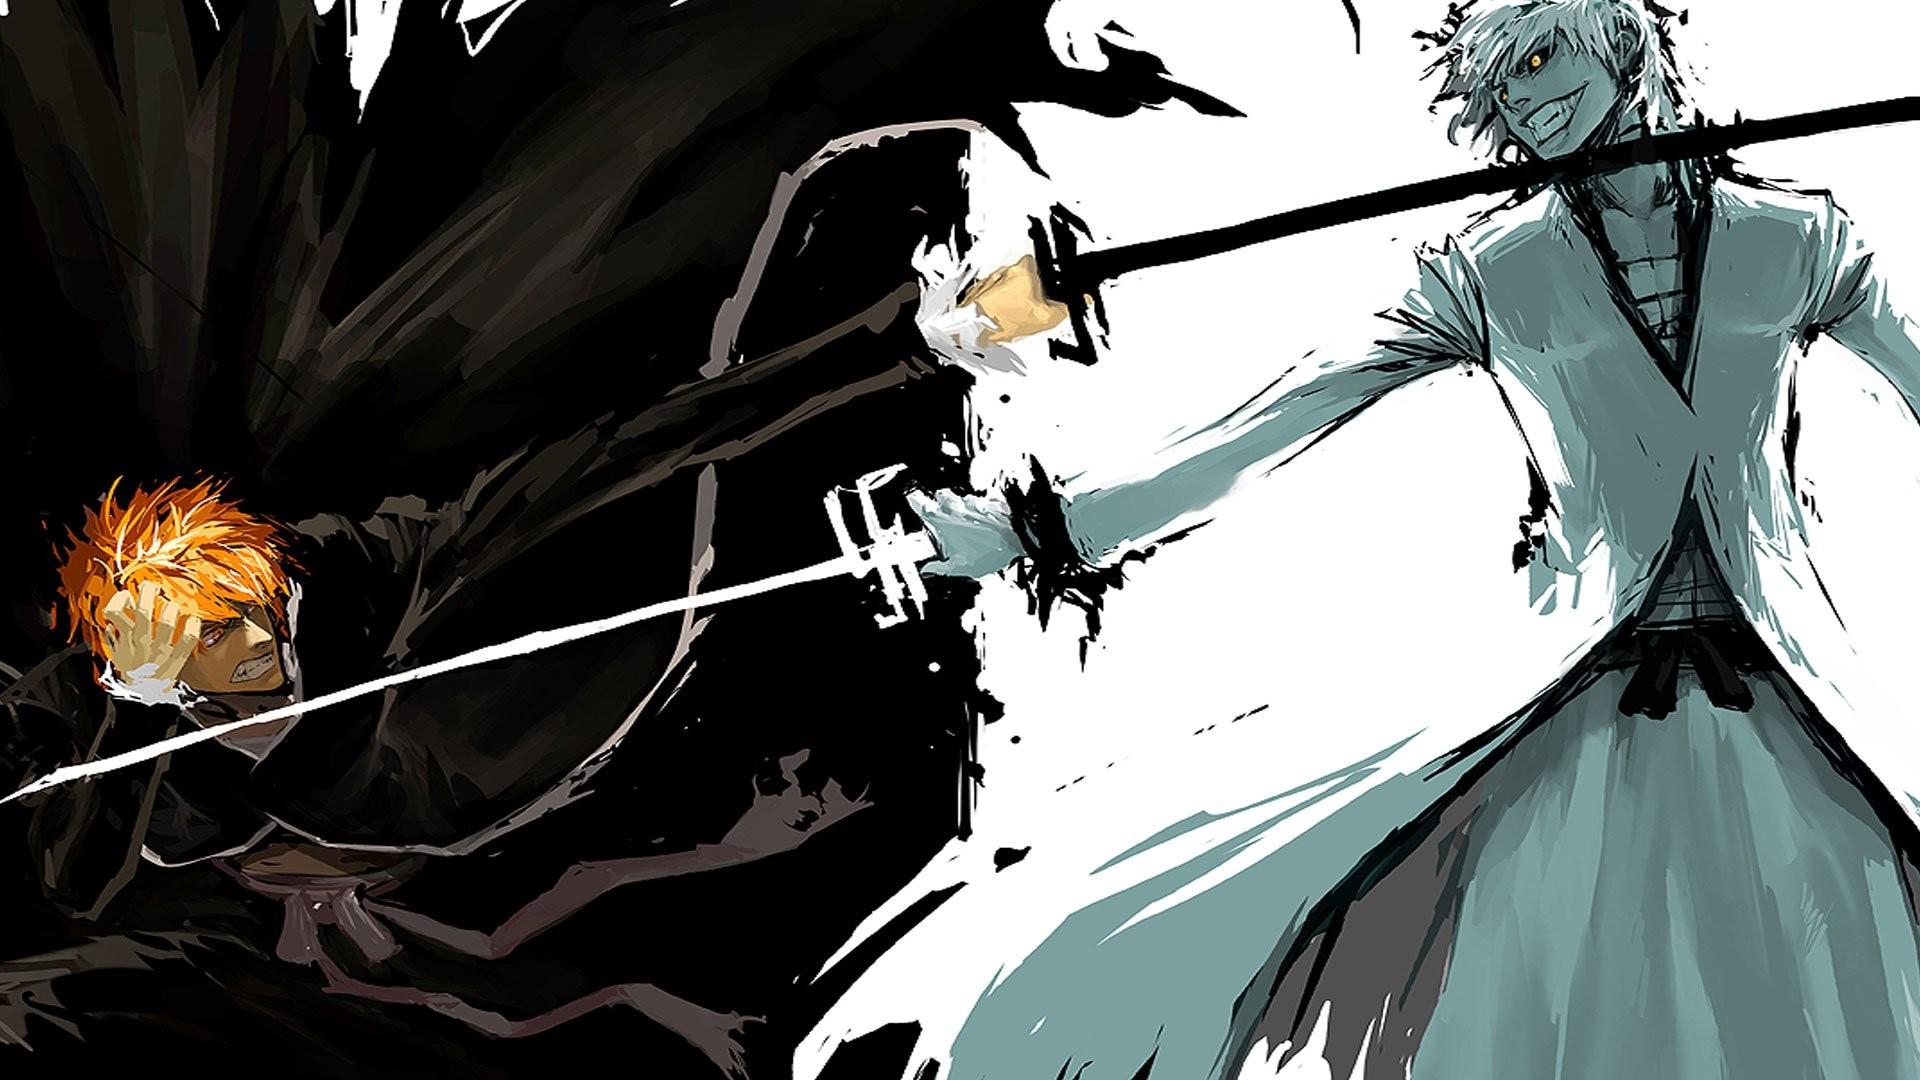 HD Wallpaper   Background ID:2499. Anime Bleach